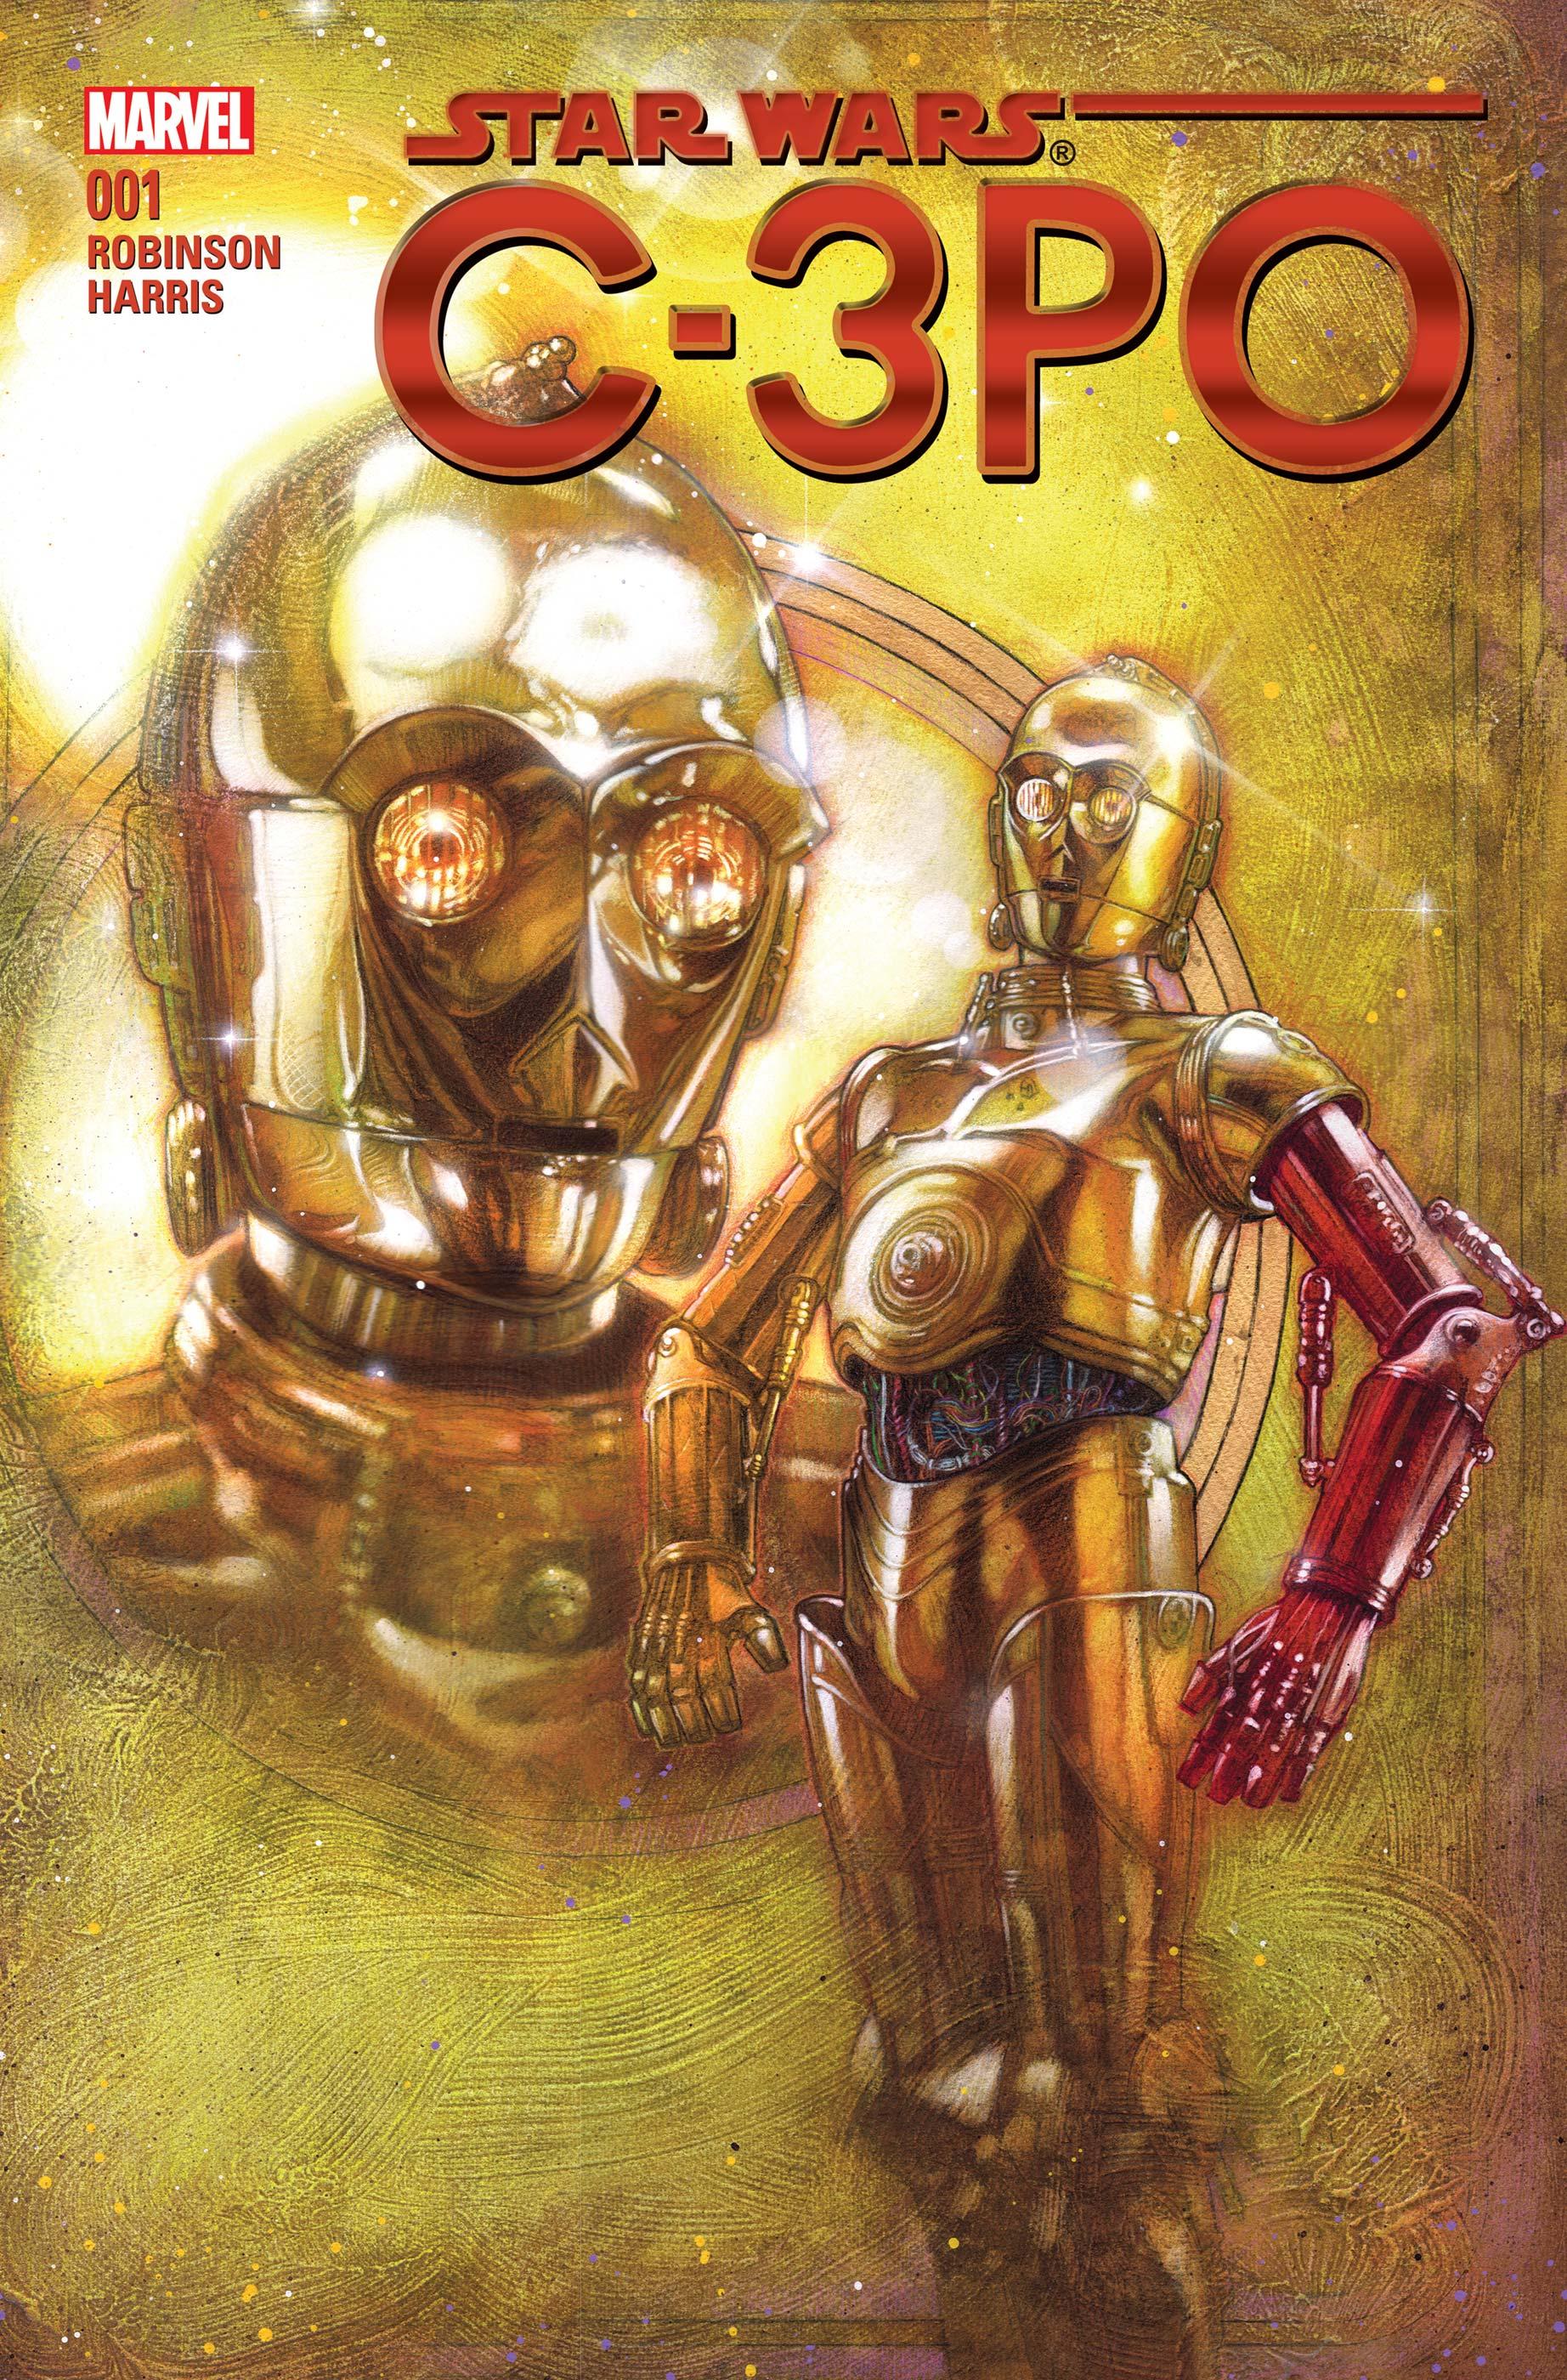 Star Wars Special: C-3PO (2016) #1